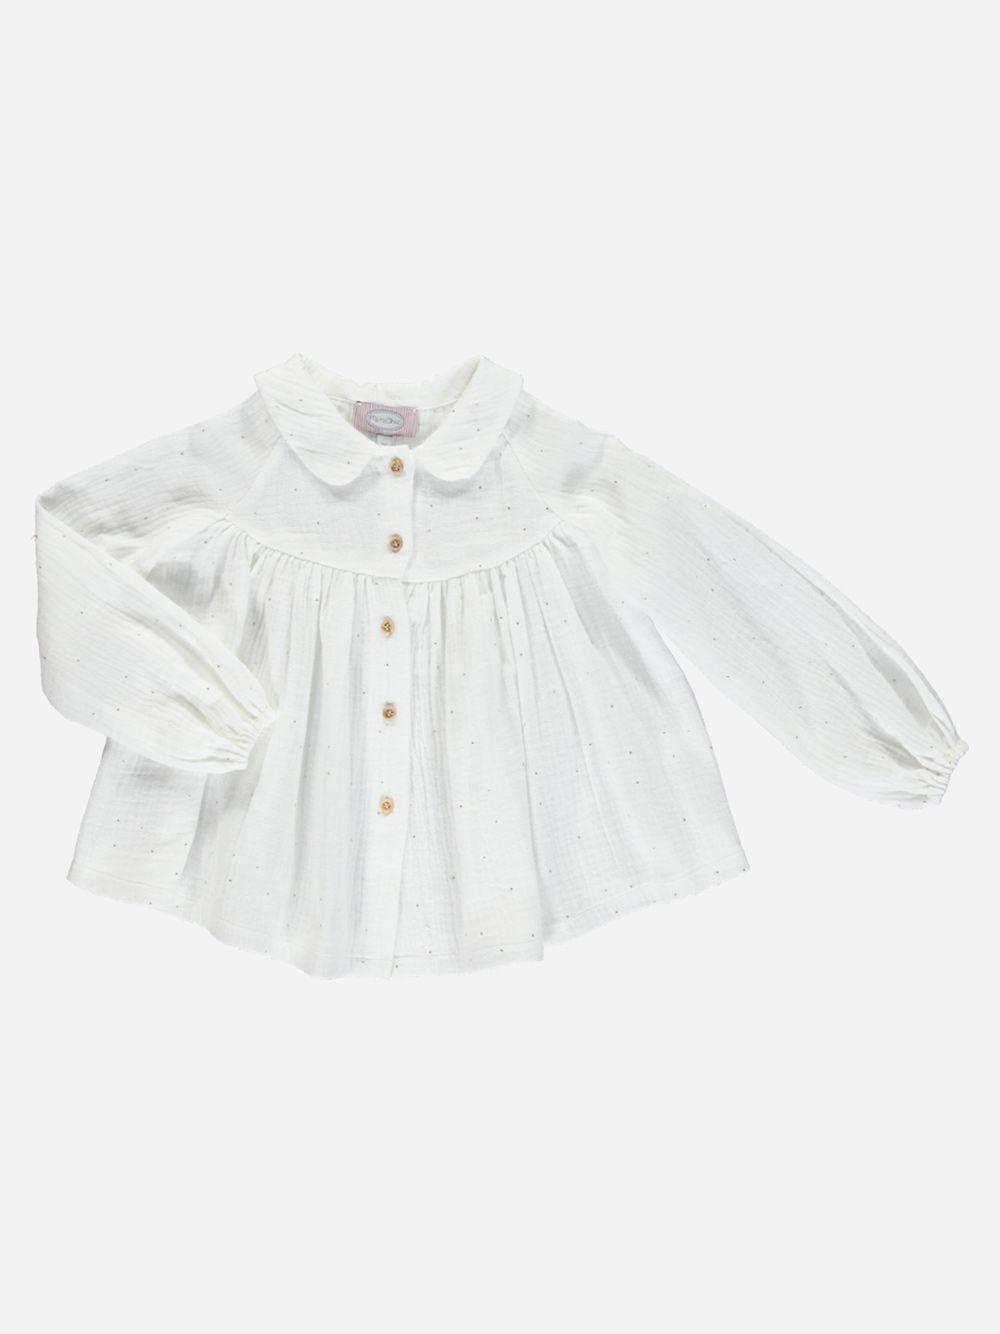 Blusa Branca Paris   Mimichic